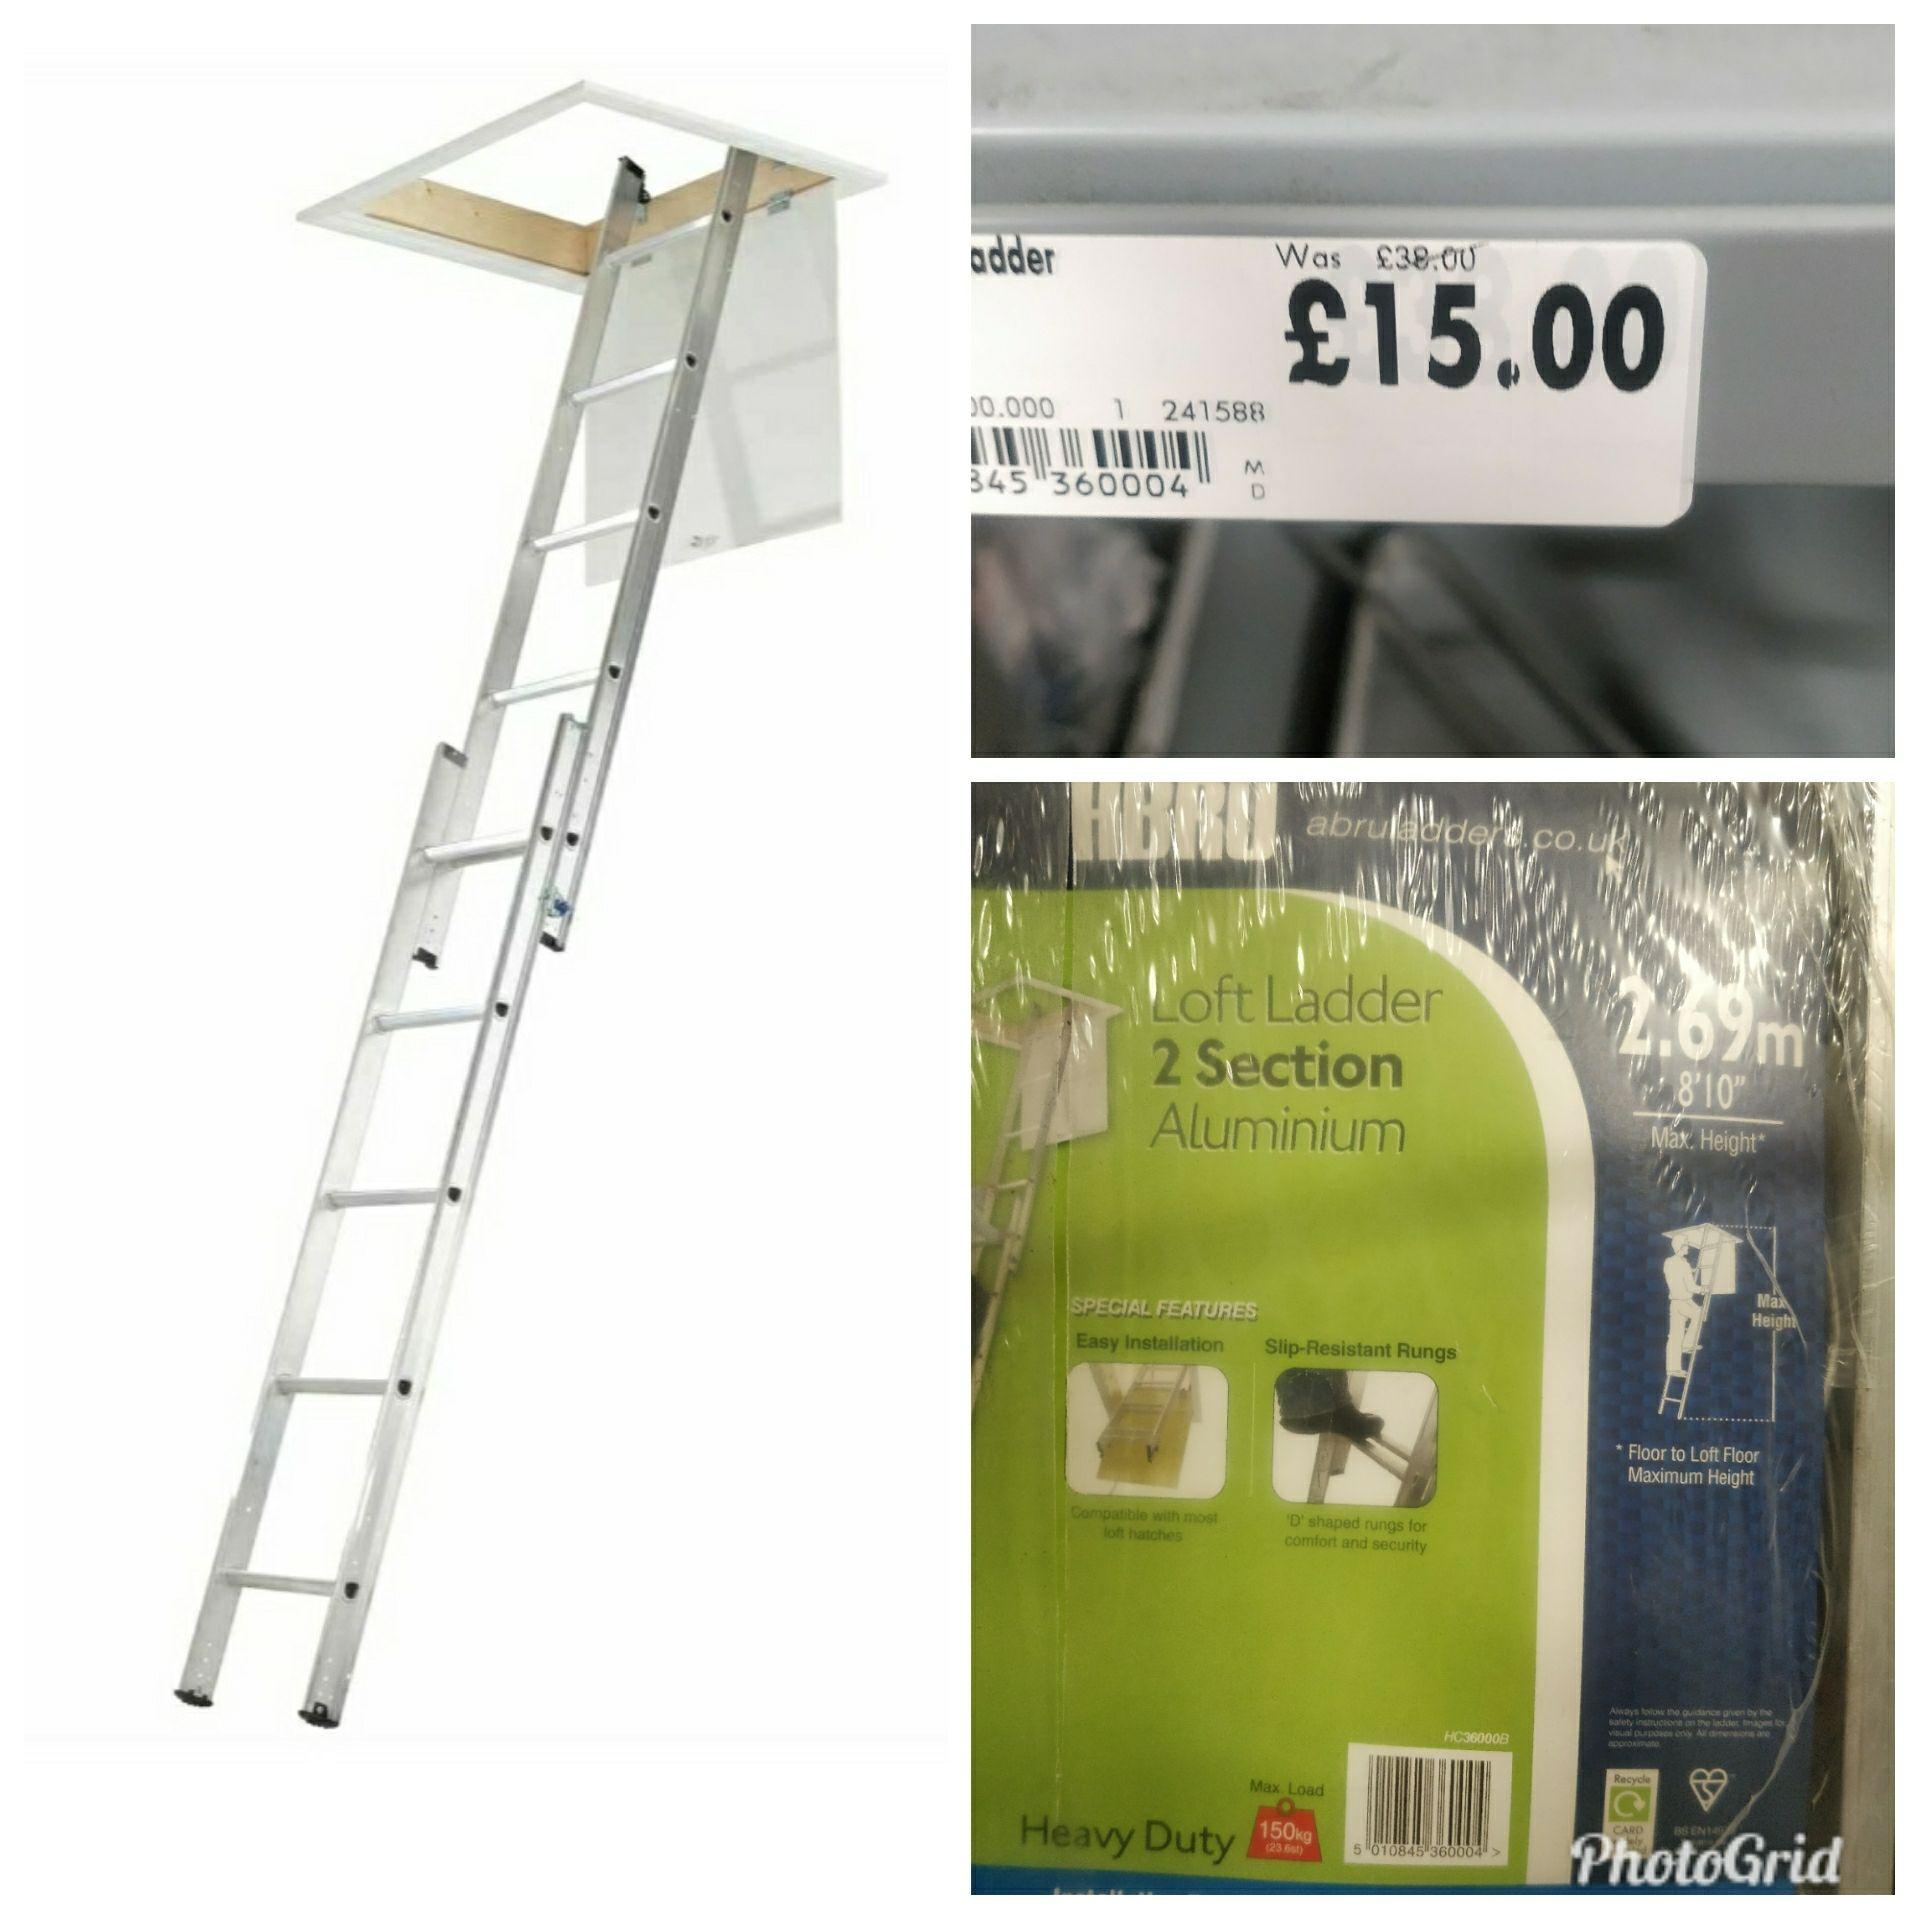 Abru 2 section loft ladder 2.69m £12.75 - Homebase